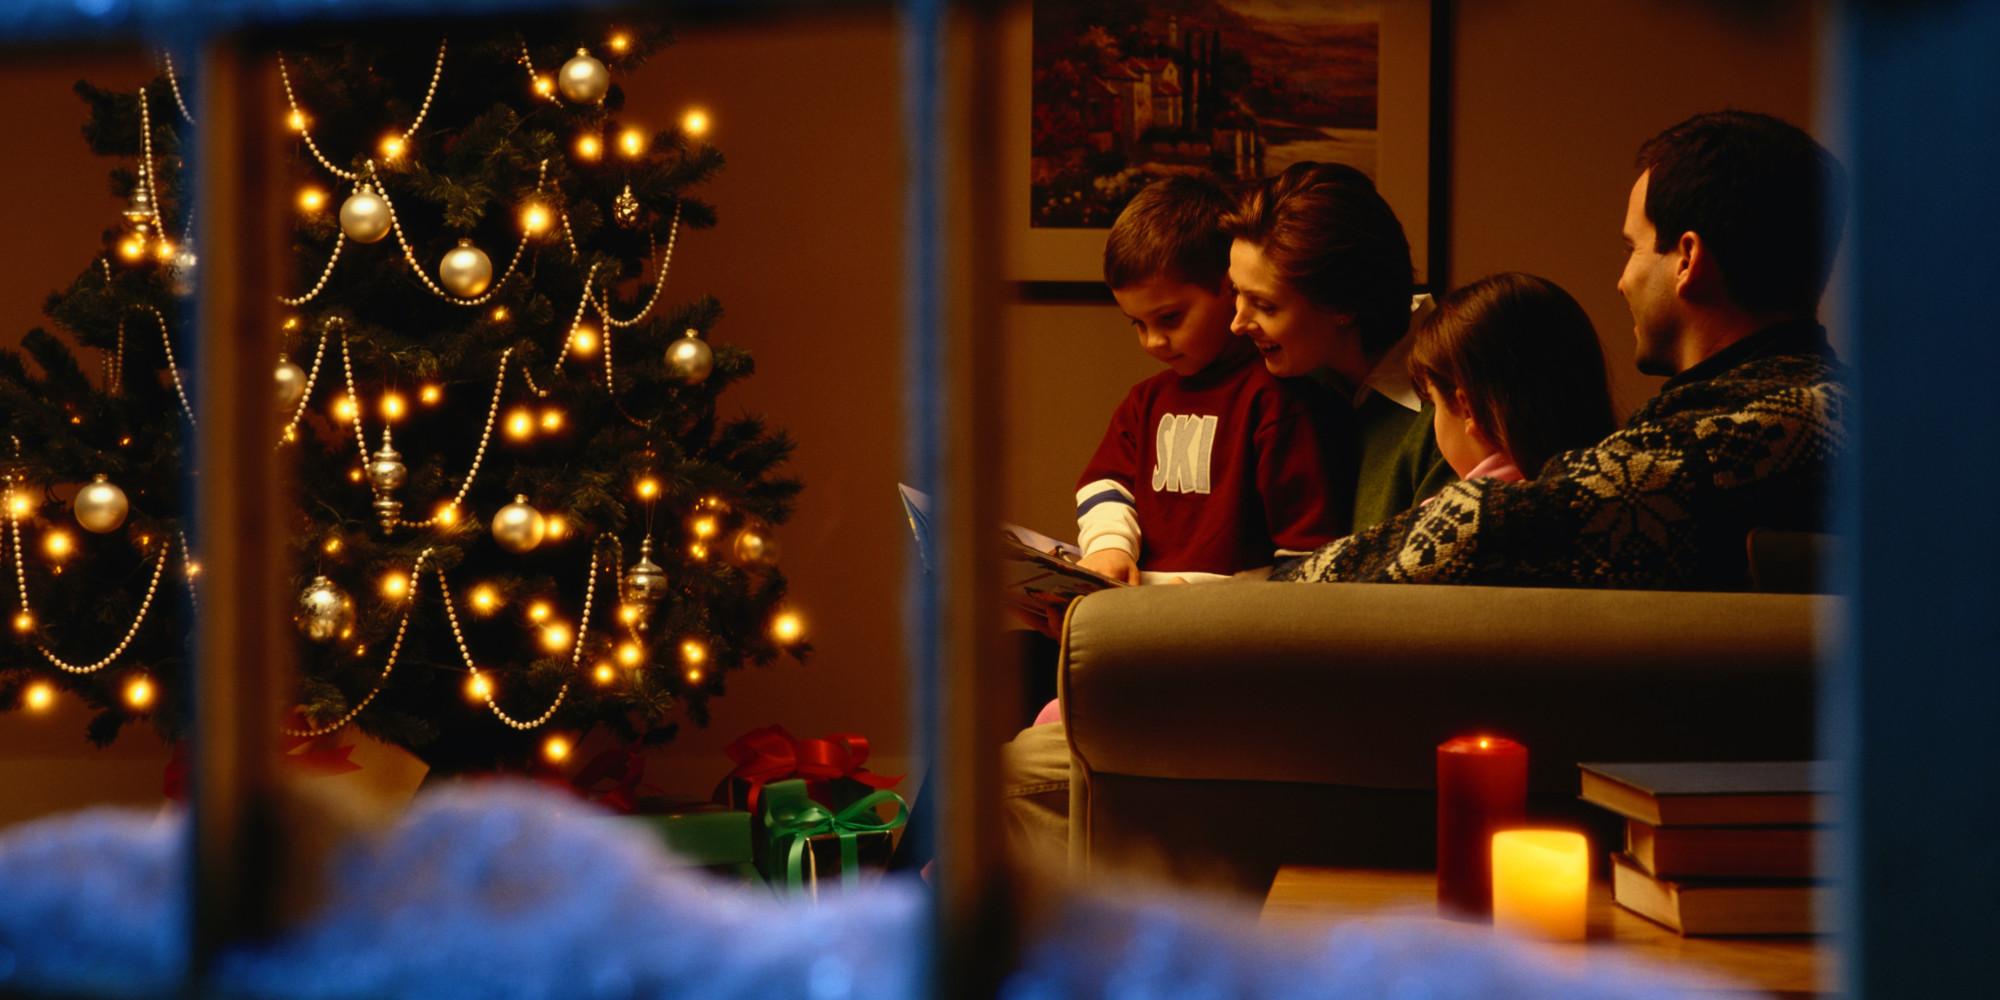 The Most Festive And NotSoFestive Christmas Scenes